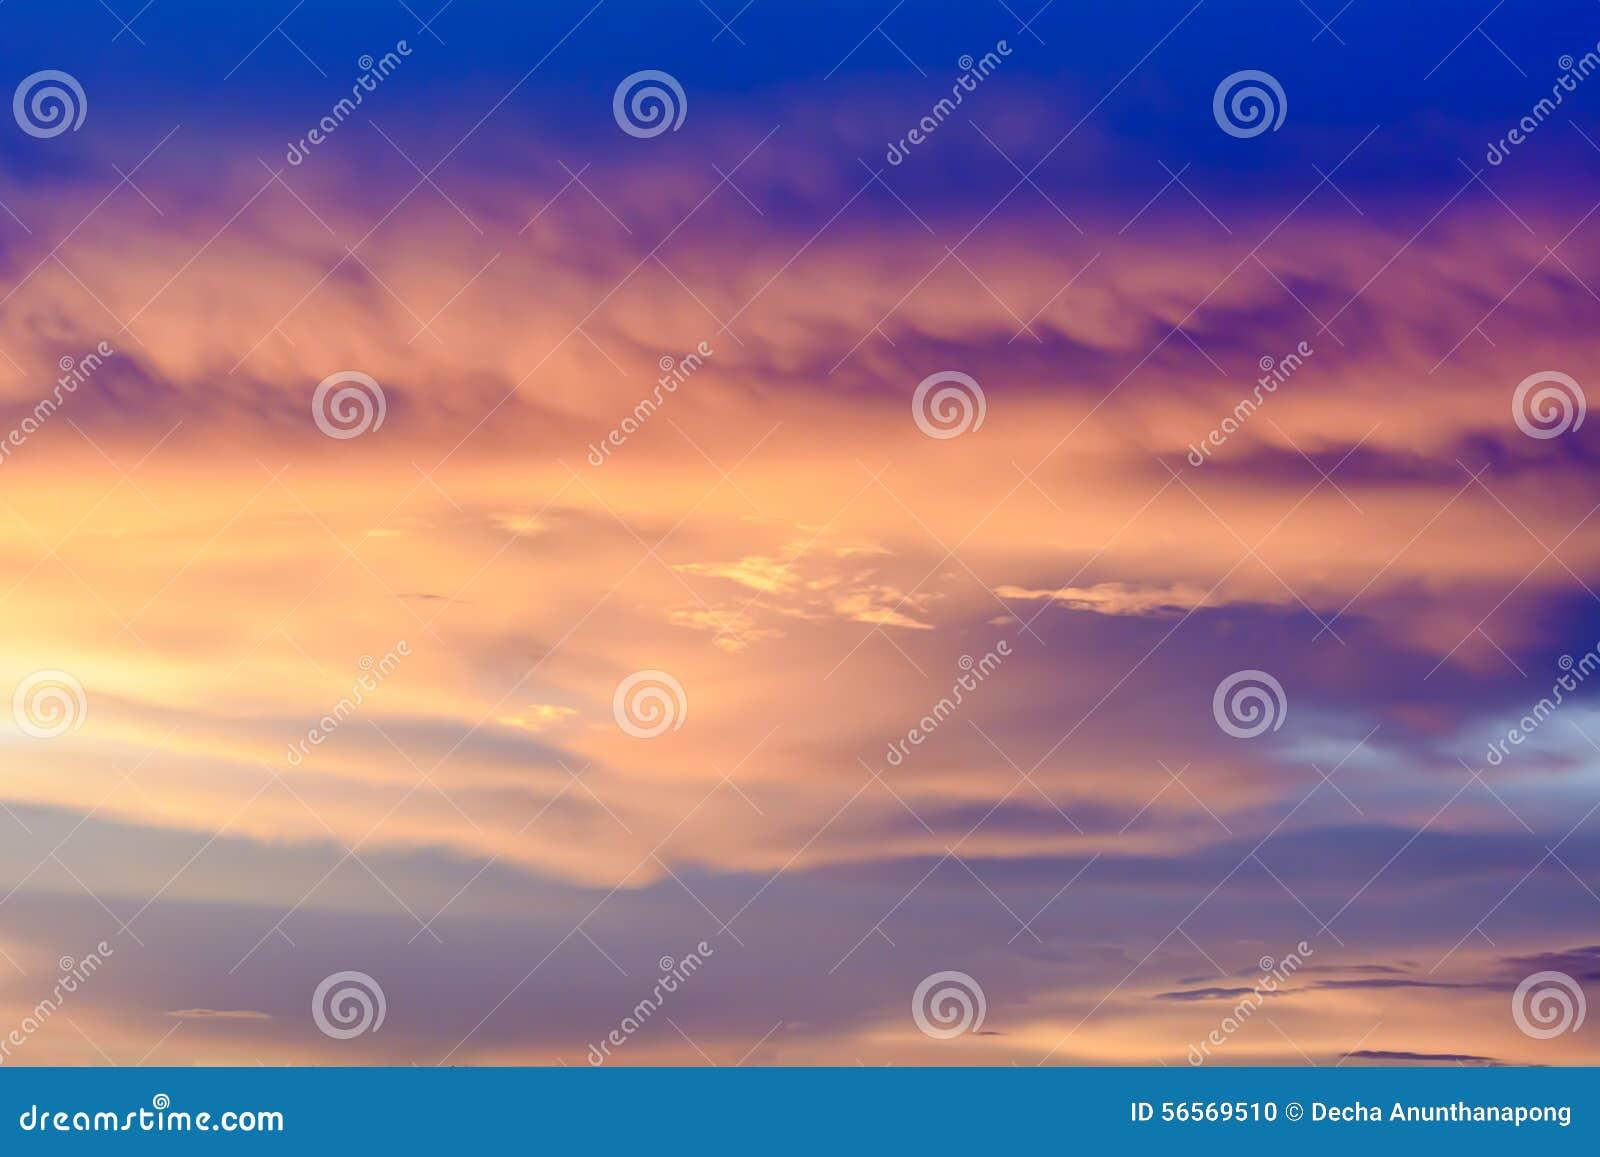 Download Ο χρυσός ουρανός είναι πολύ όμορφος και του ήλιου ακριβώς μέσα Στοκ Εικόνες - εικόνα από birdbaths, συννεφιασμένος: 56569510